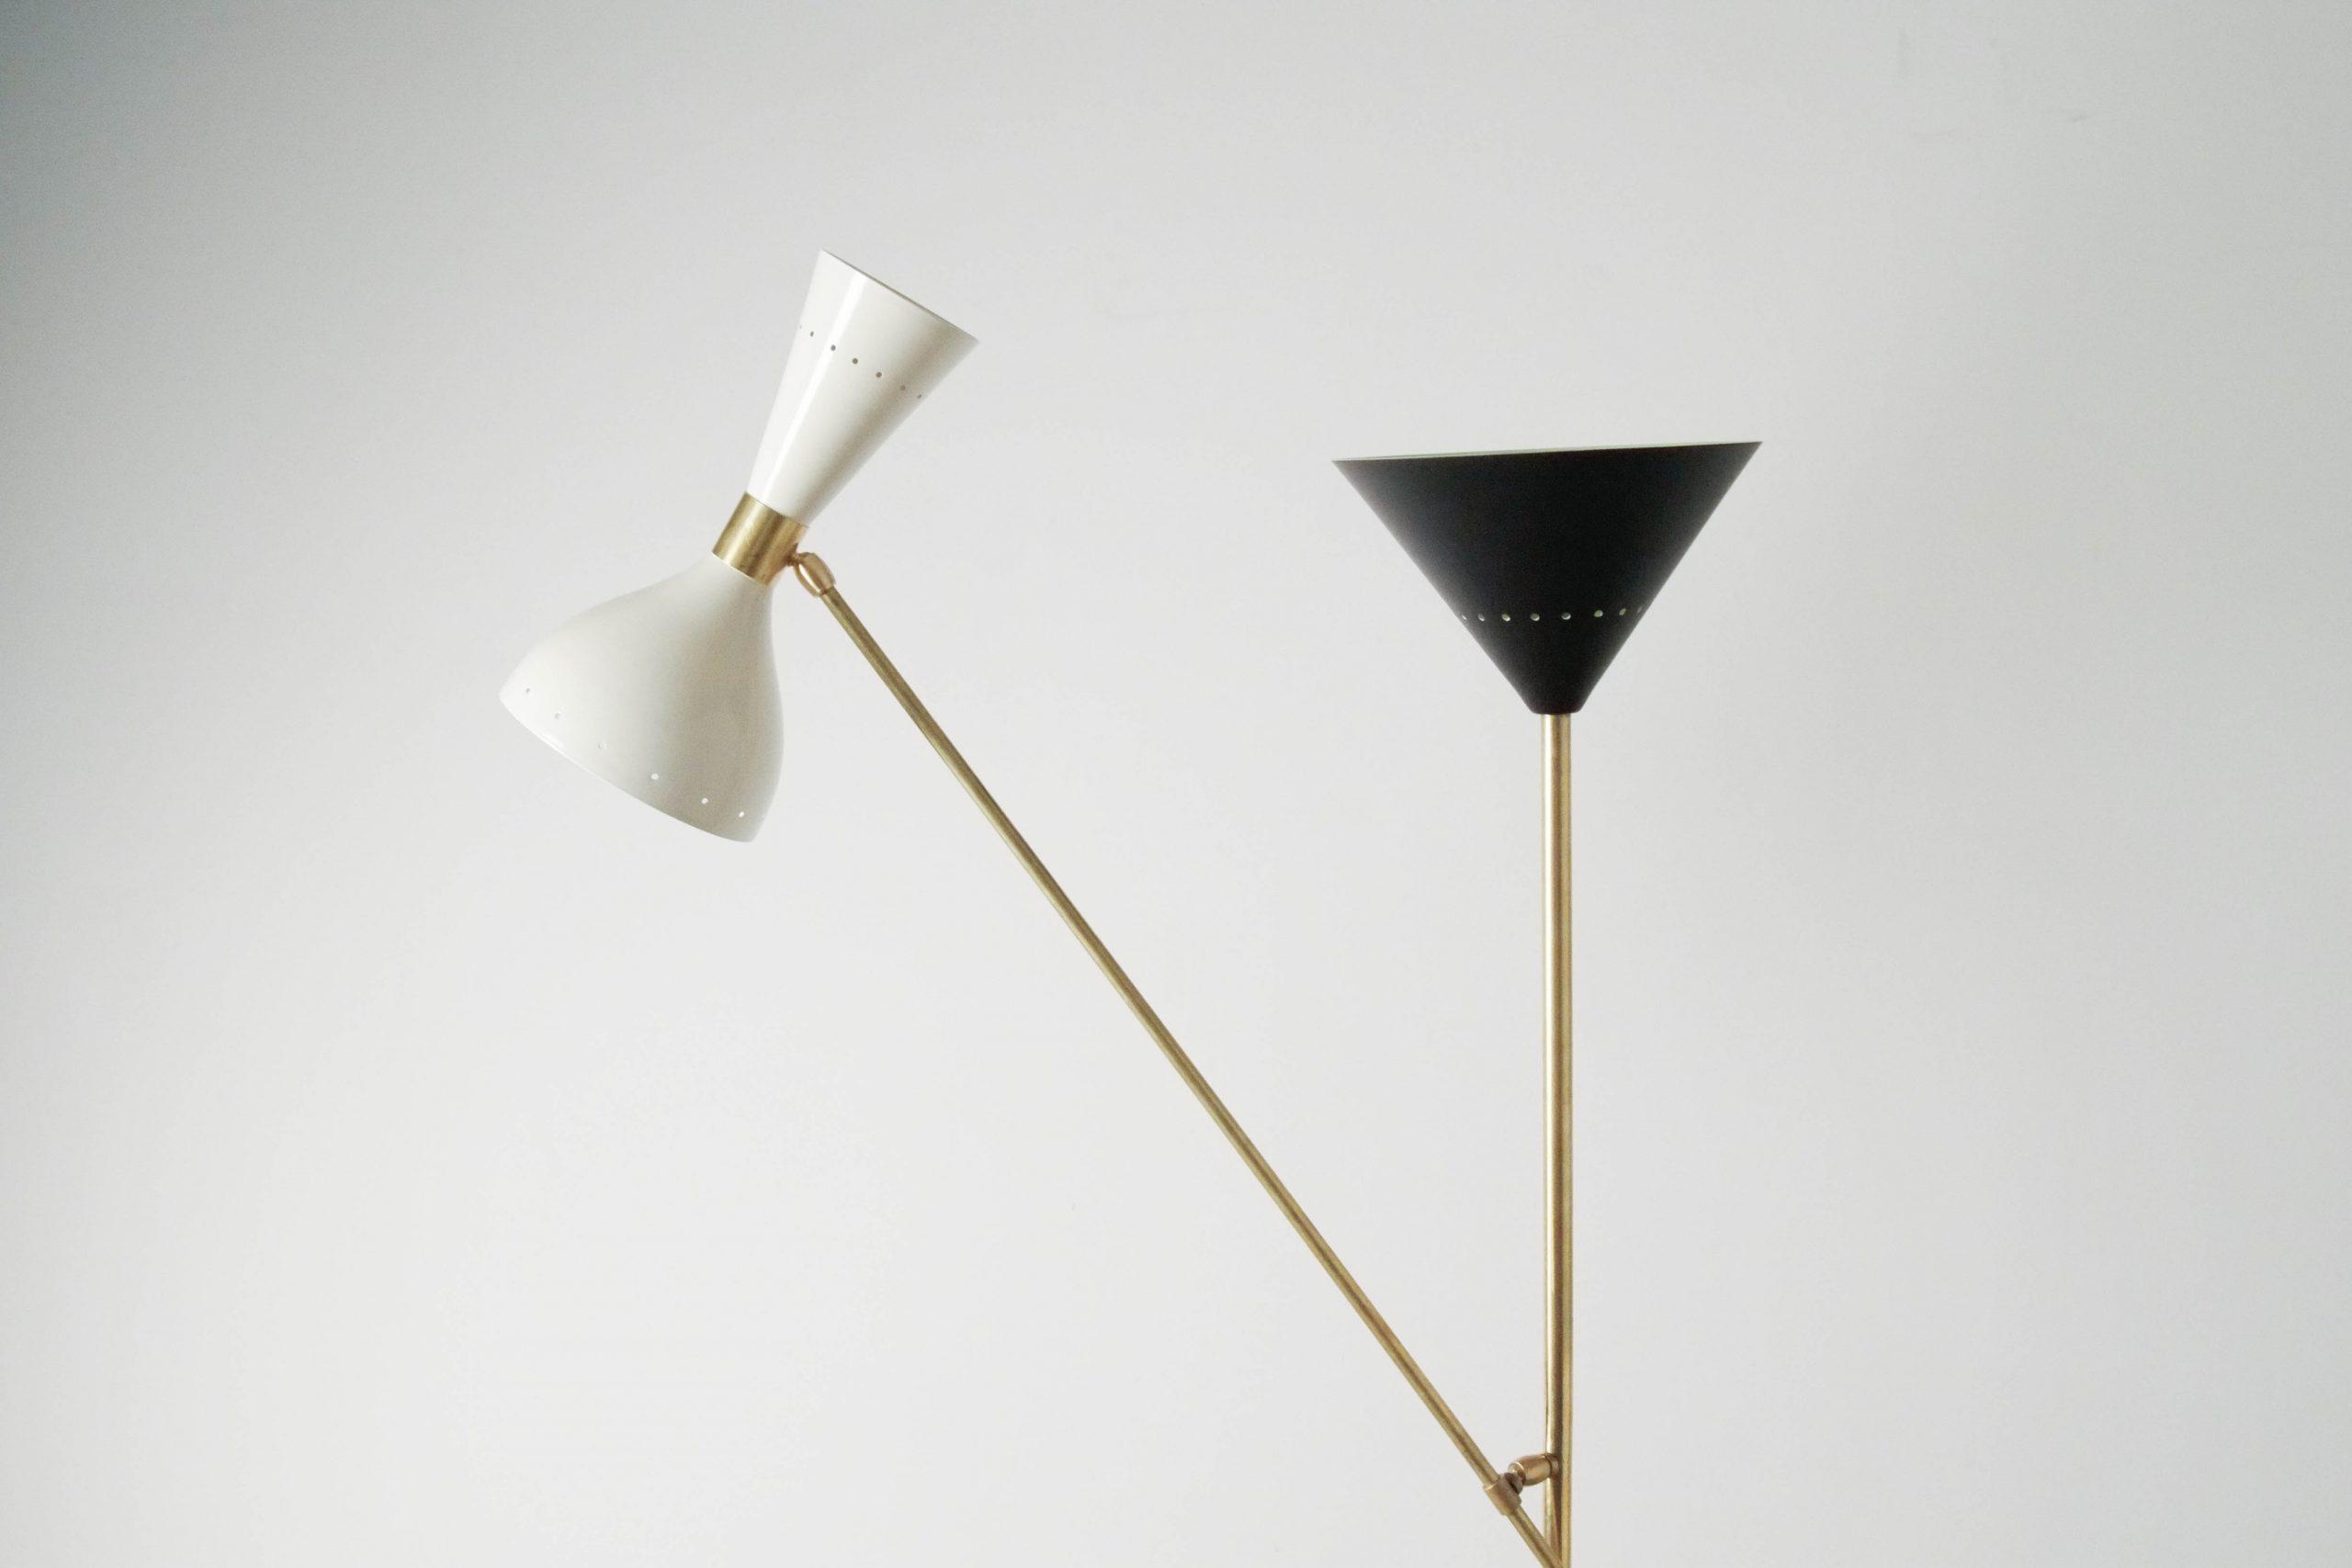 lampara geometrica de laton elegante iluminacion indirecta